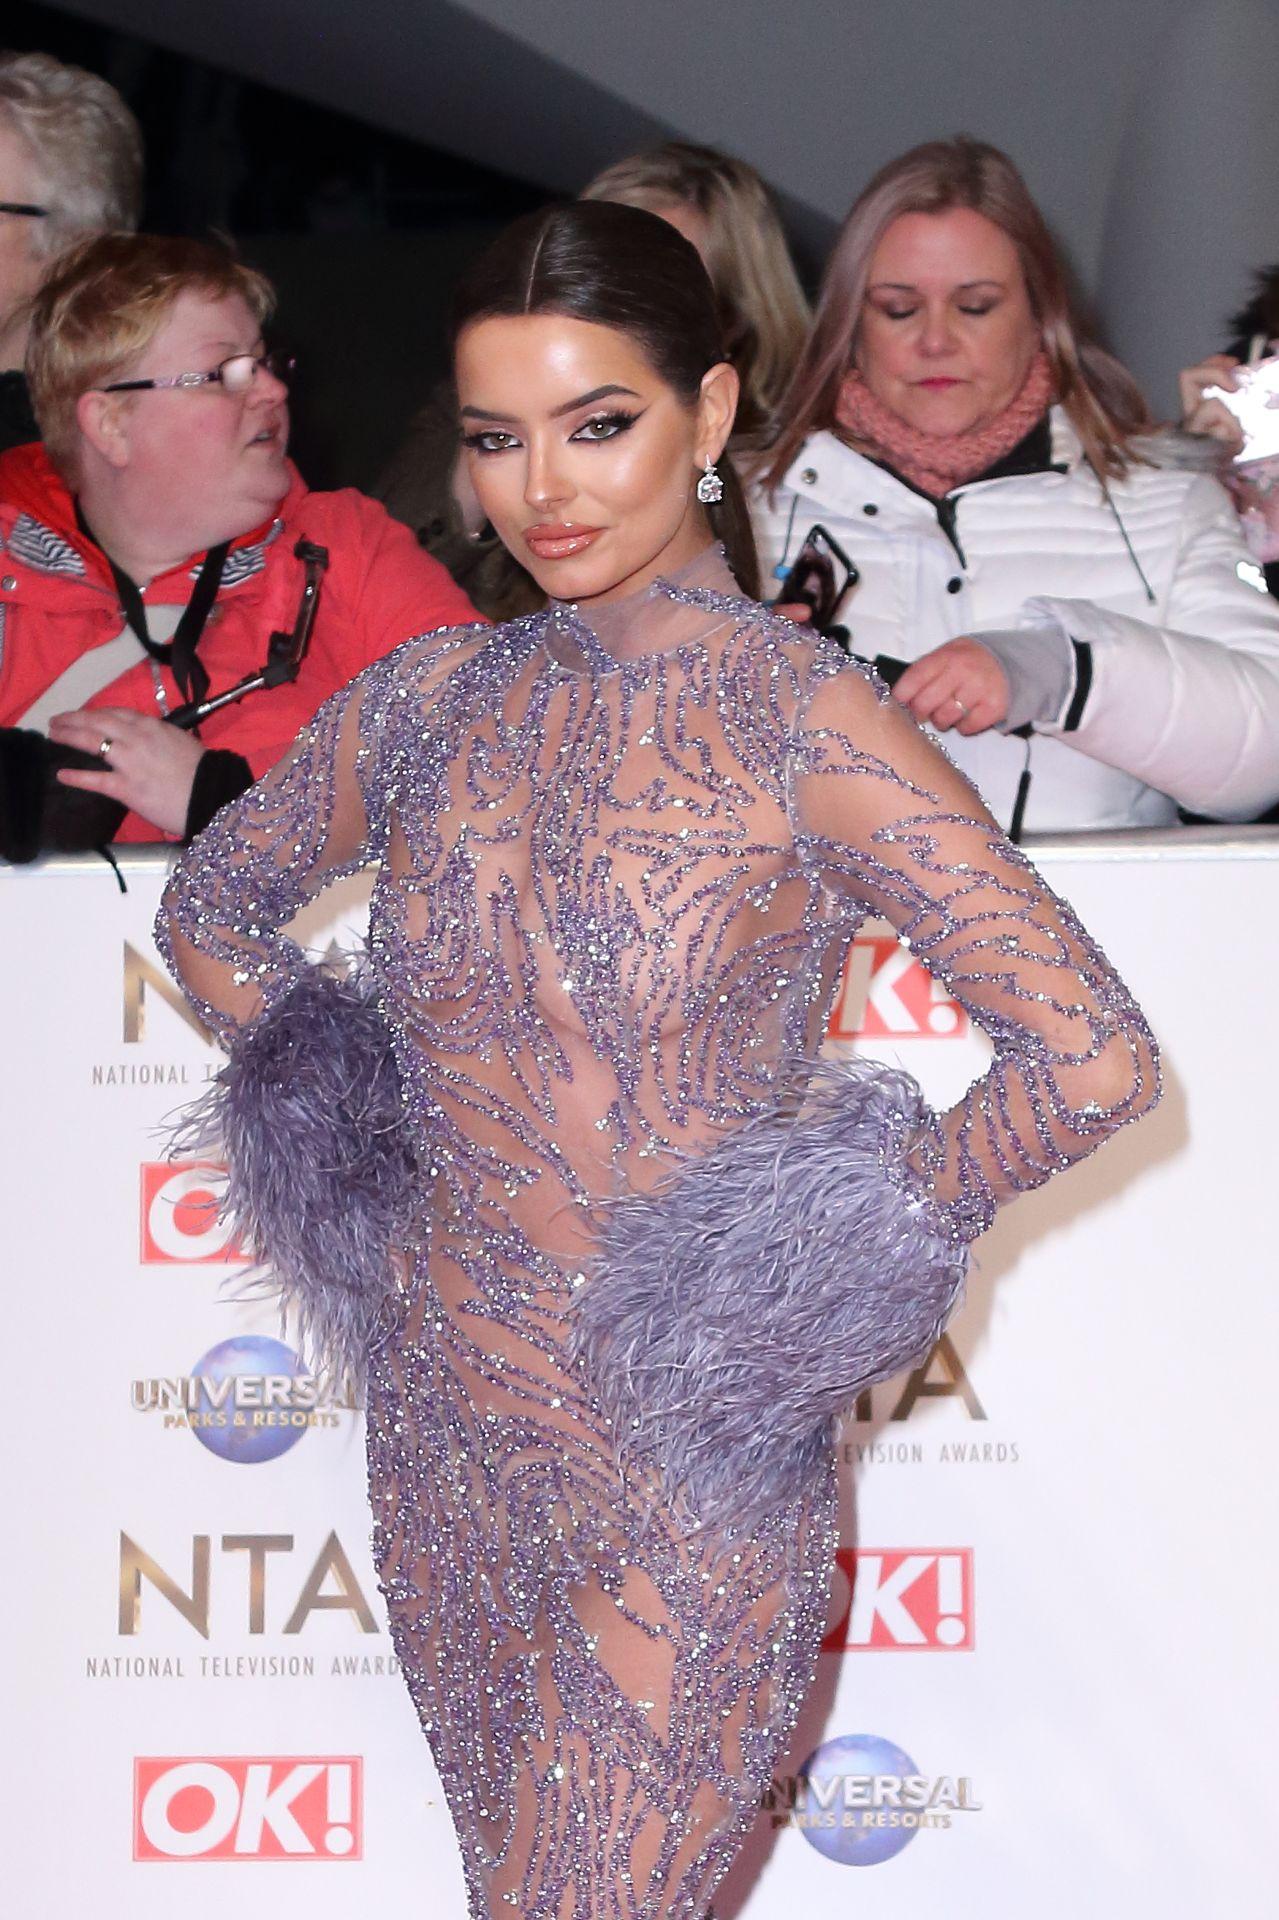 Maura Higgins Looks Hot At The National Television Awards 0016